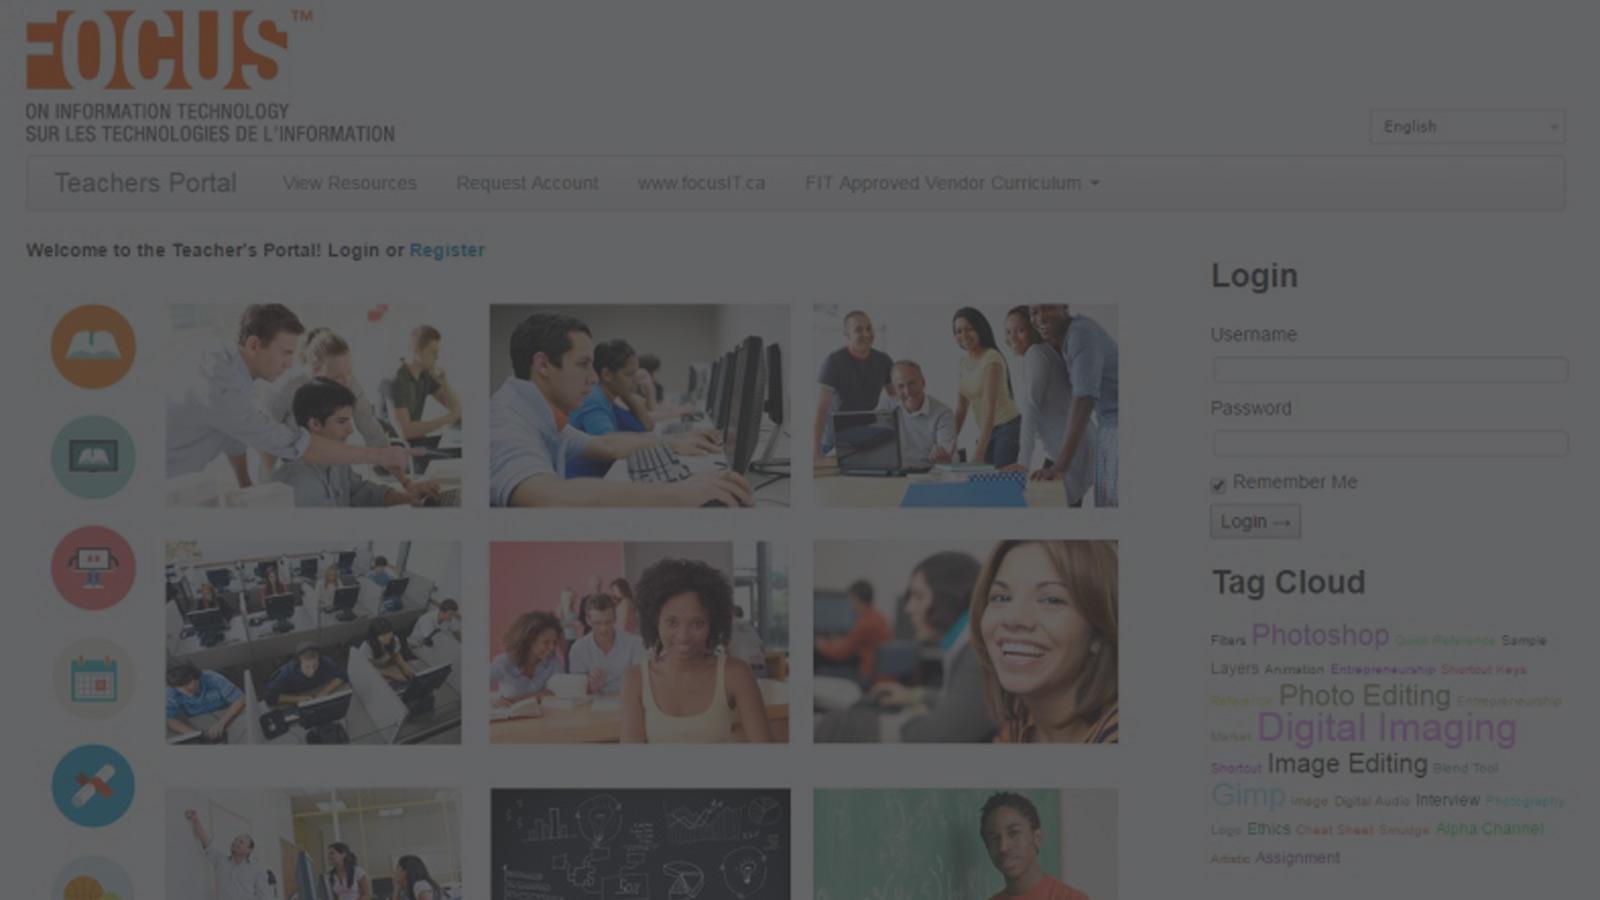 Teachers Portal